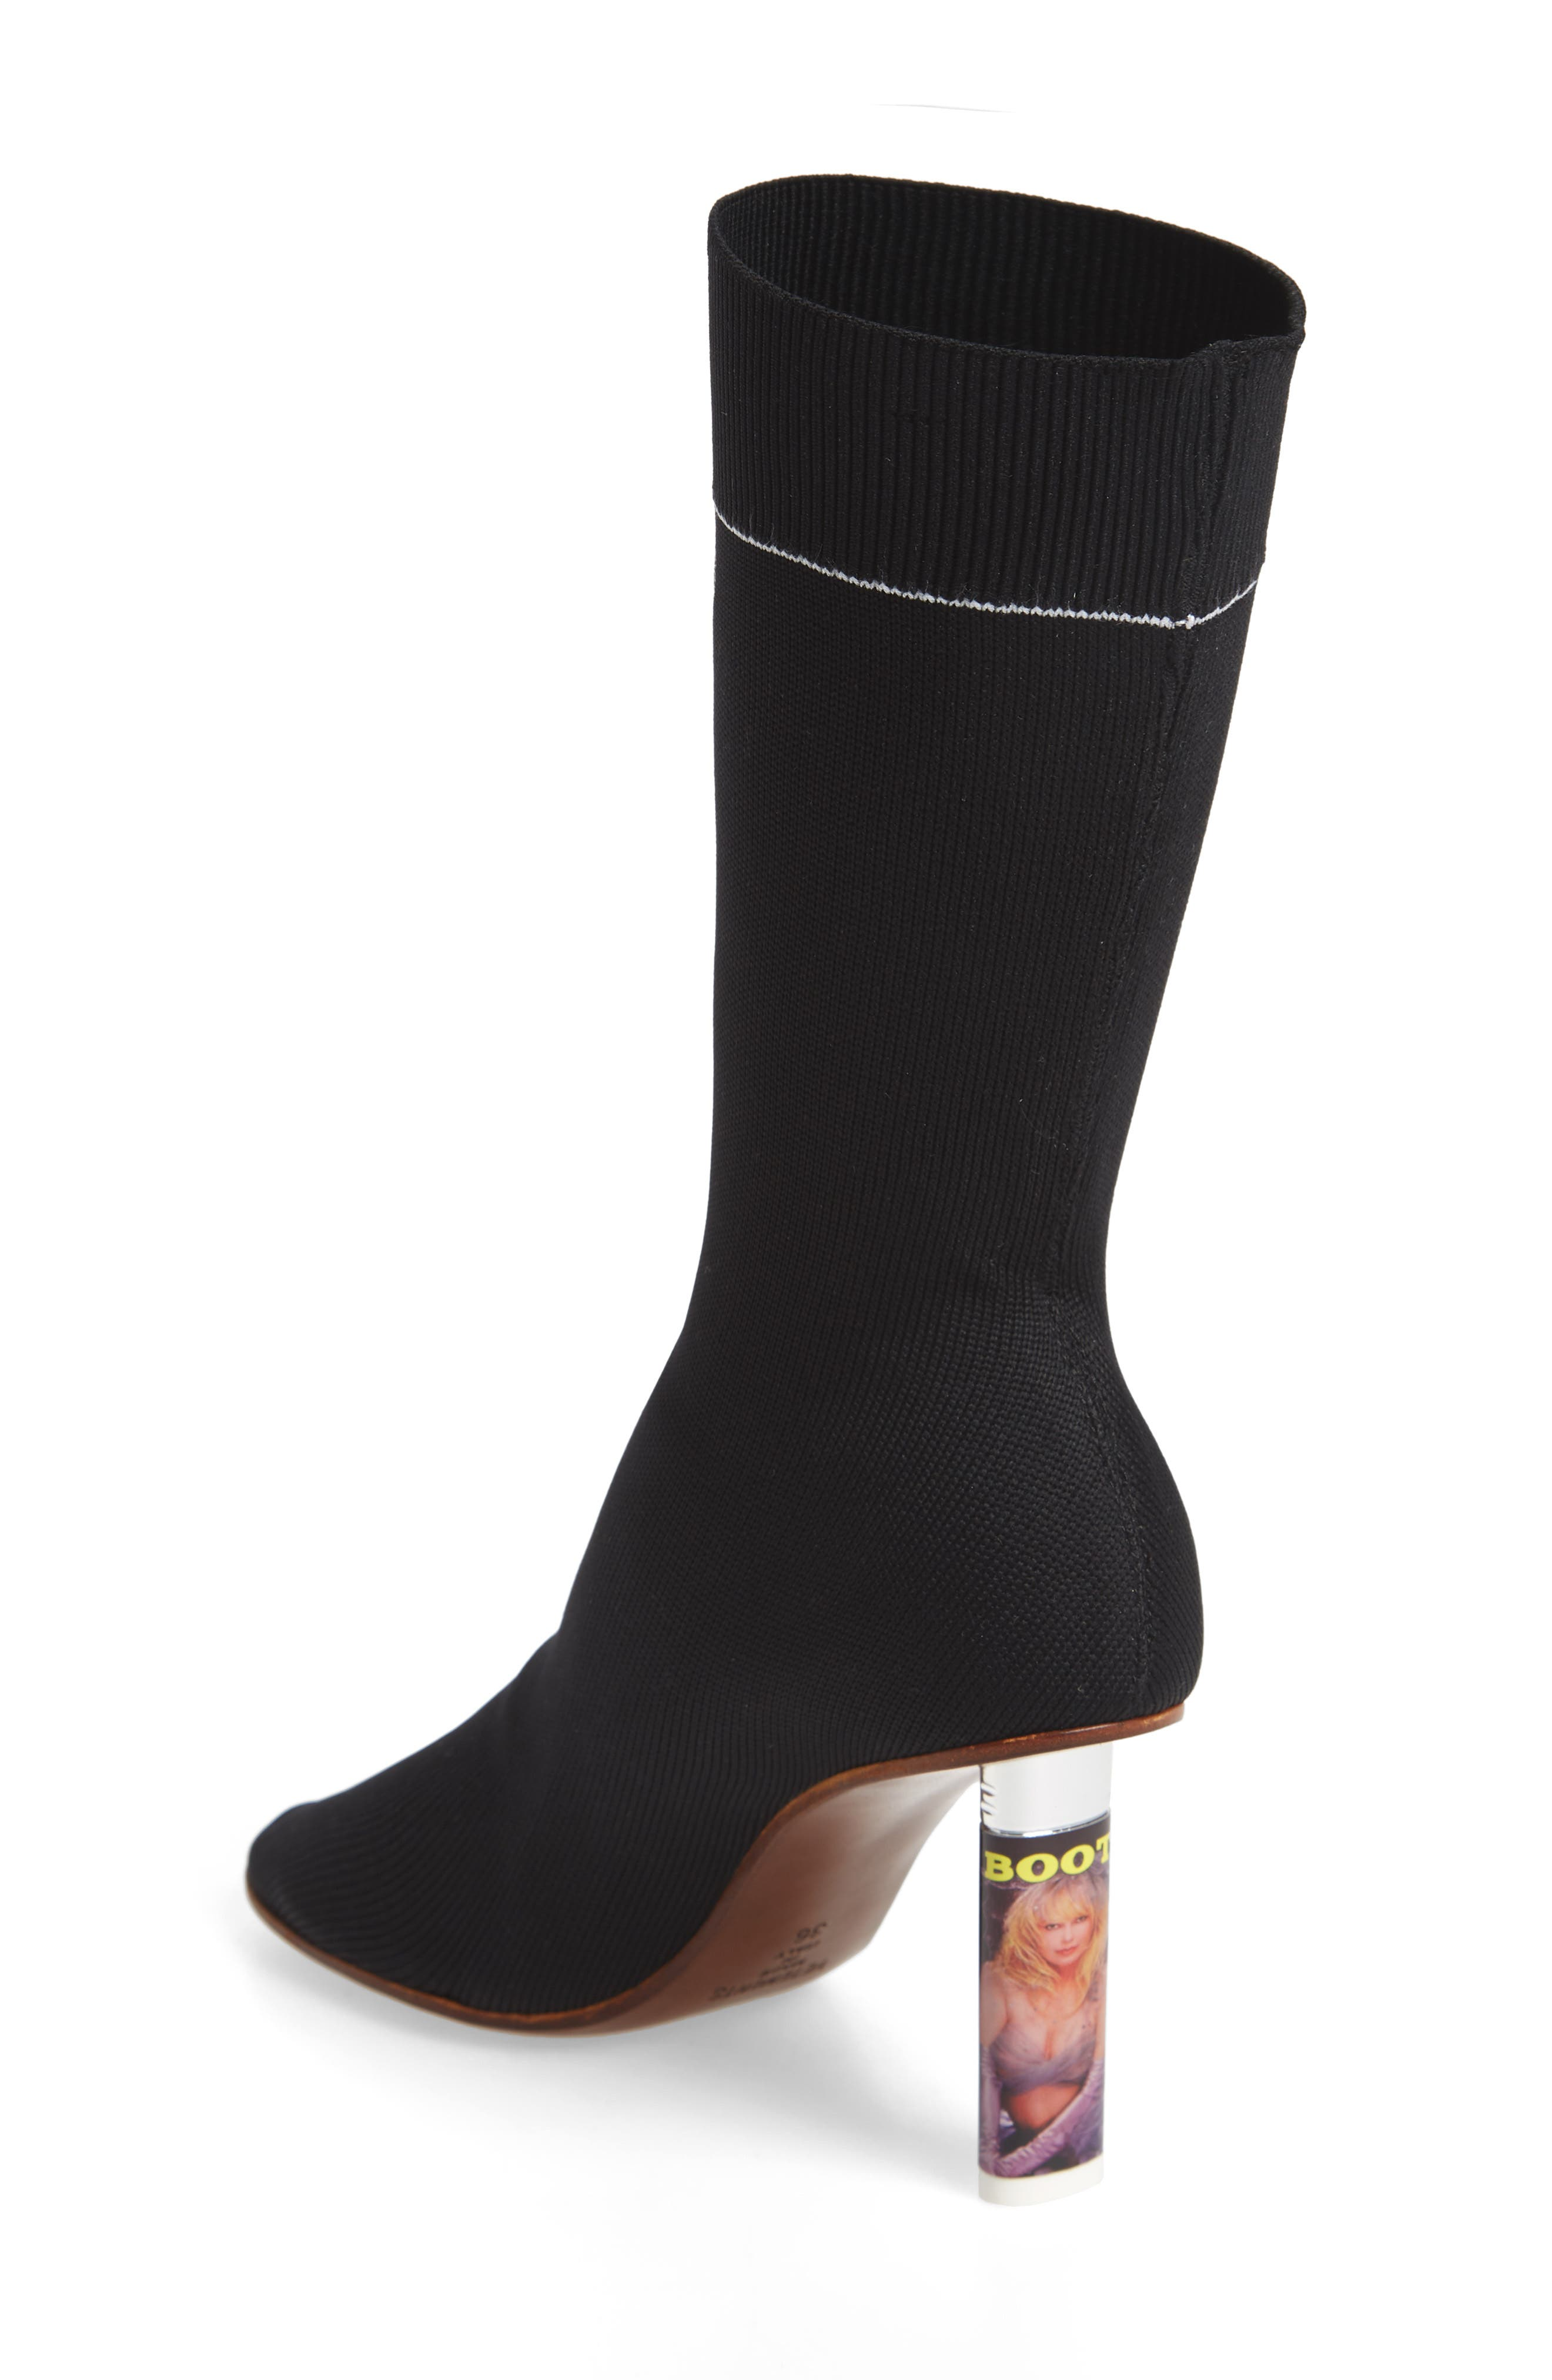 Lighter Sock Boot,                             Alternate thumbnail 2, color,                             Black/Printed Heel